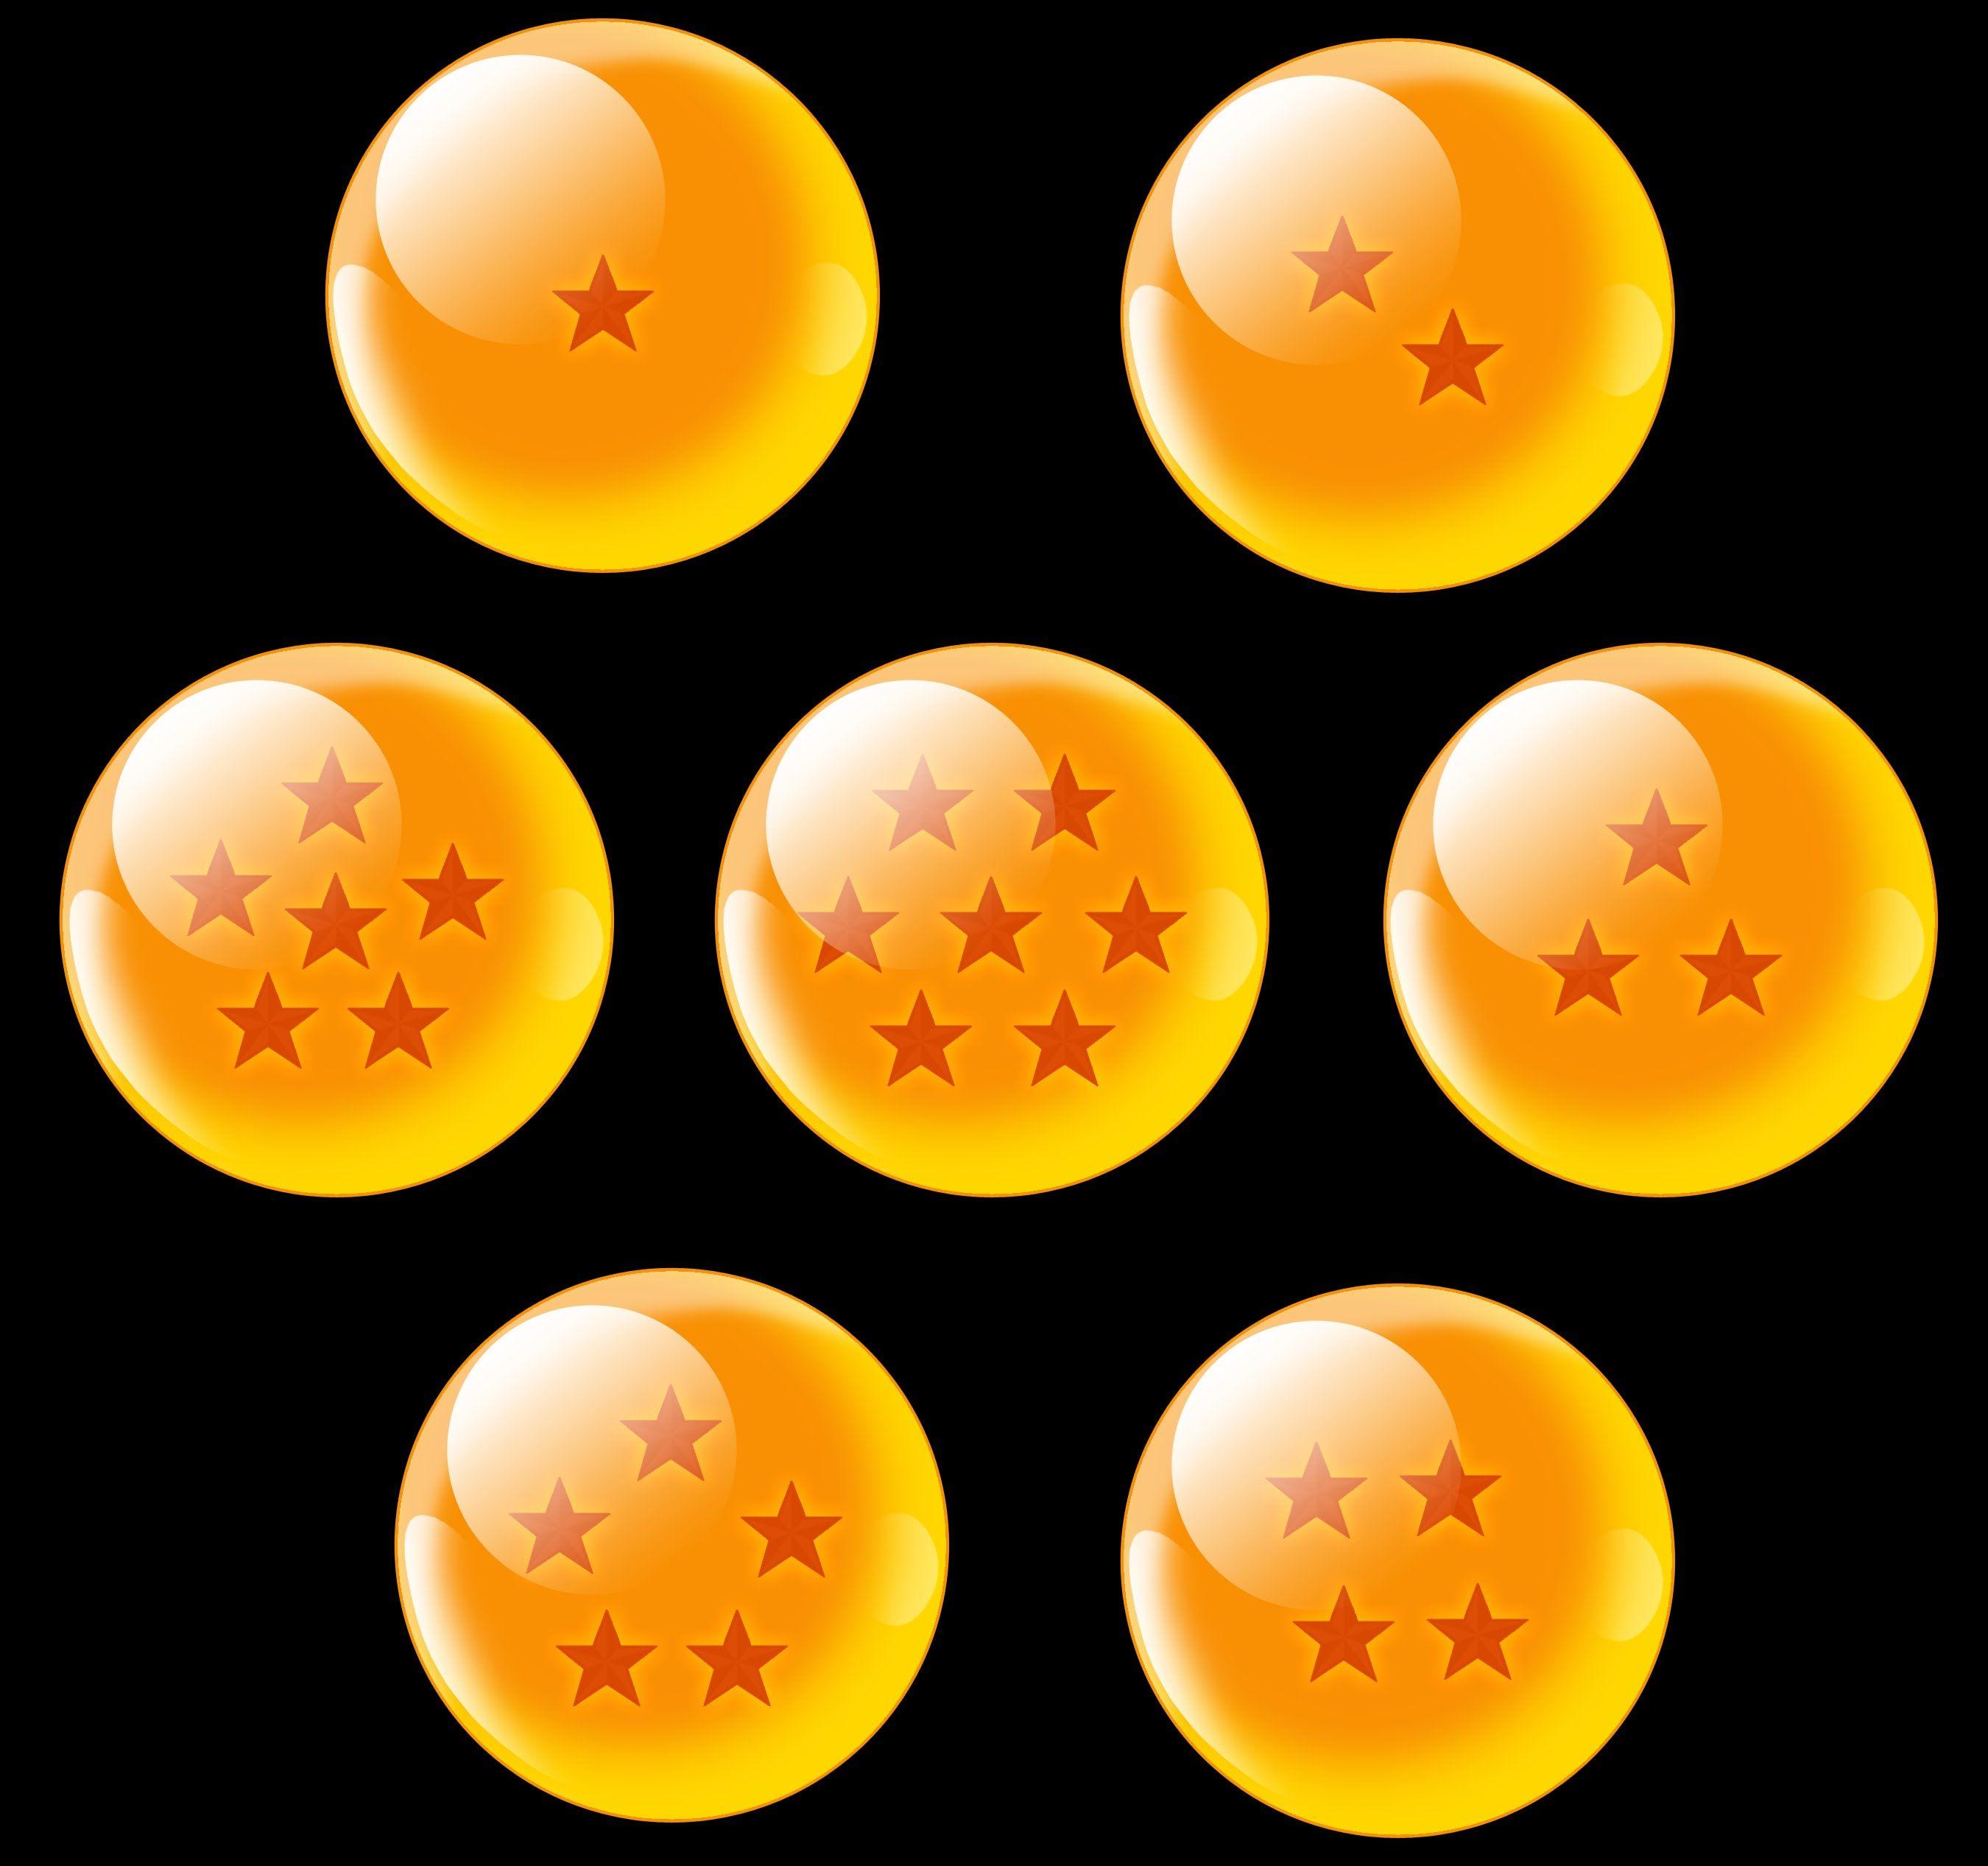 Pin De Luzia Da Silva Oliveira En Dragon Ball Las Esferas Del Dragon Imagenes De Goku Dragones Wallpaper